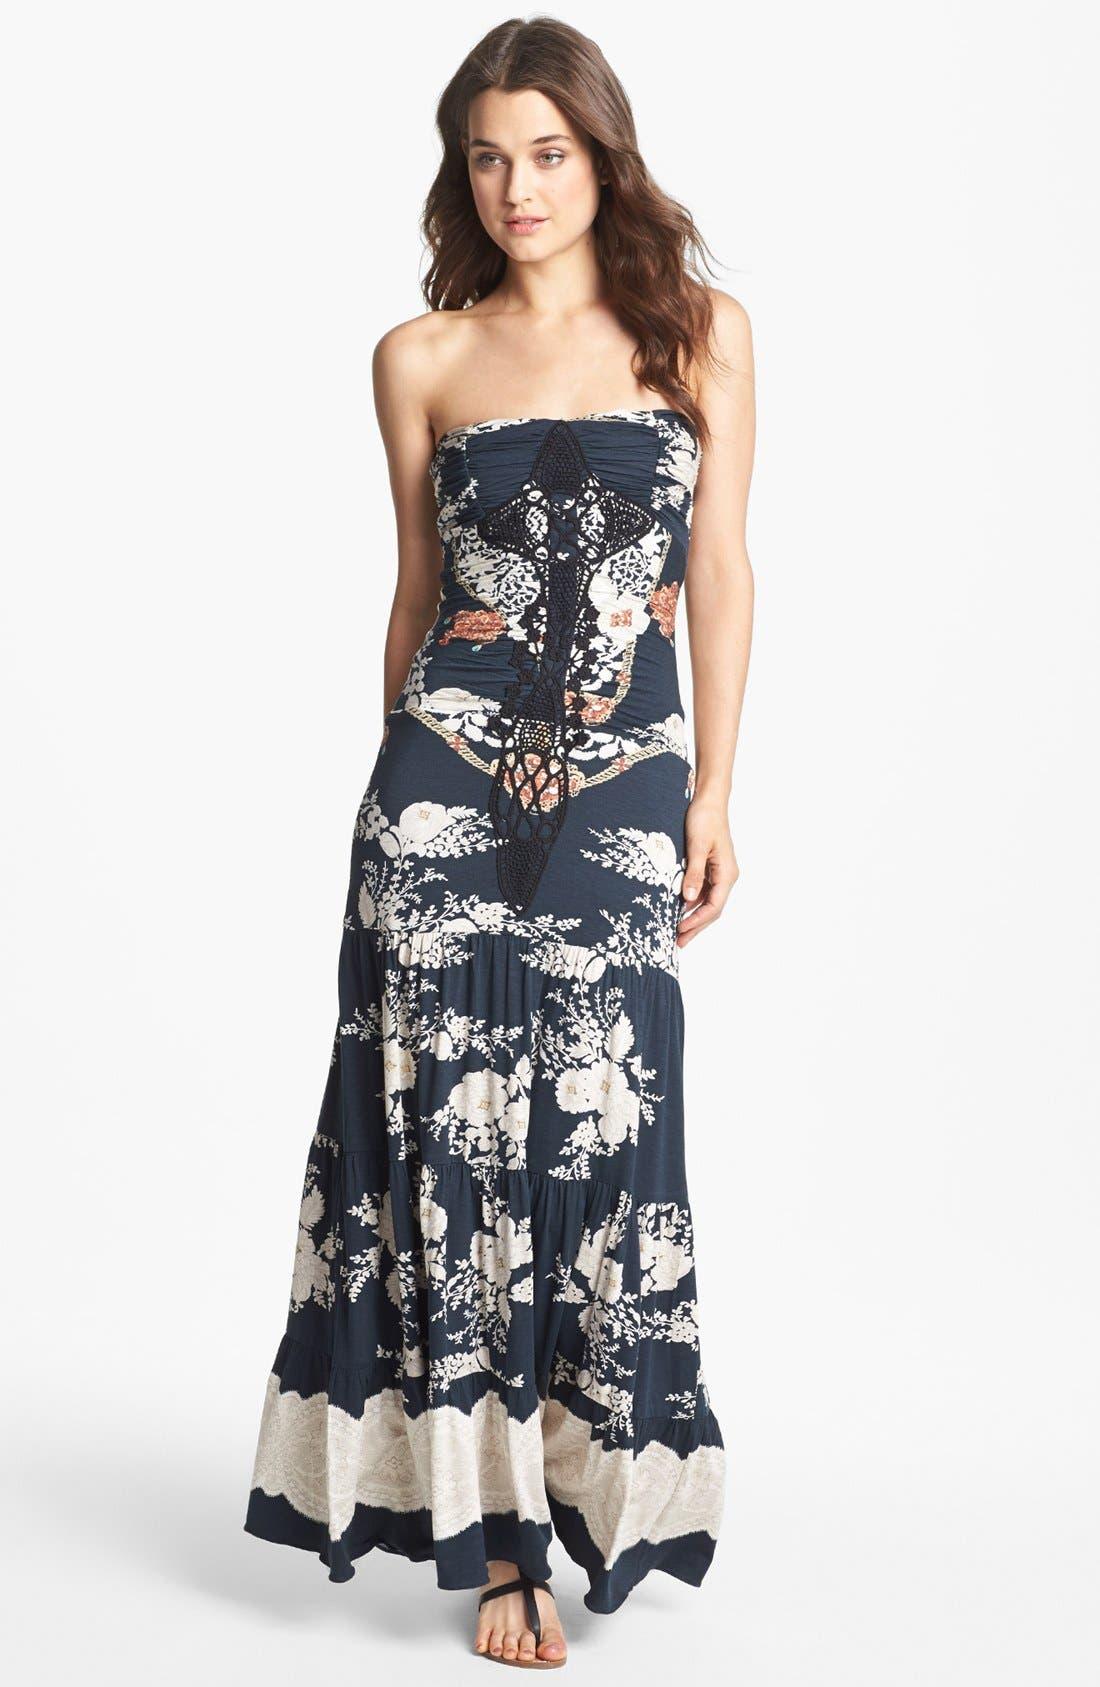 Main Image - Sky Print Embellished Maxi Dress